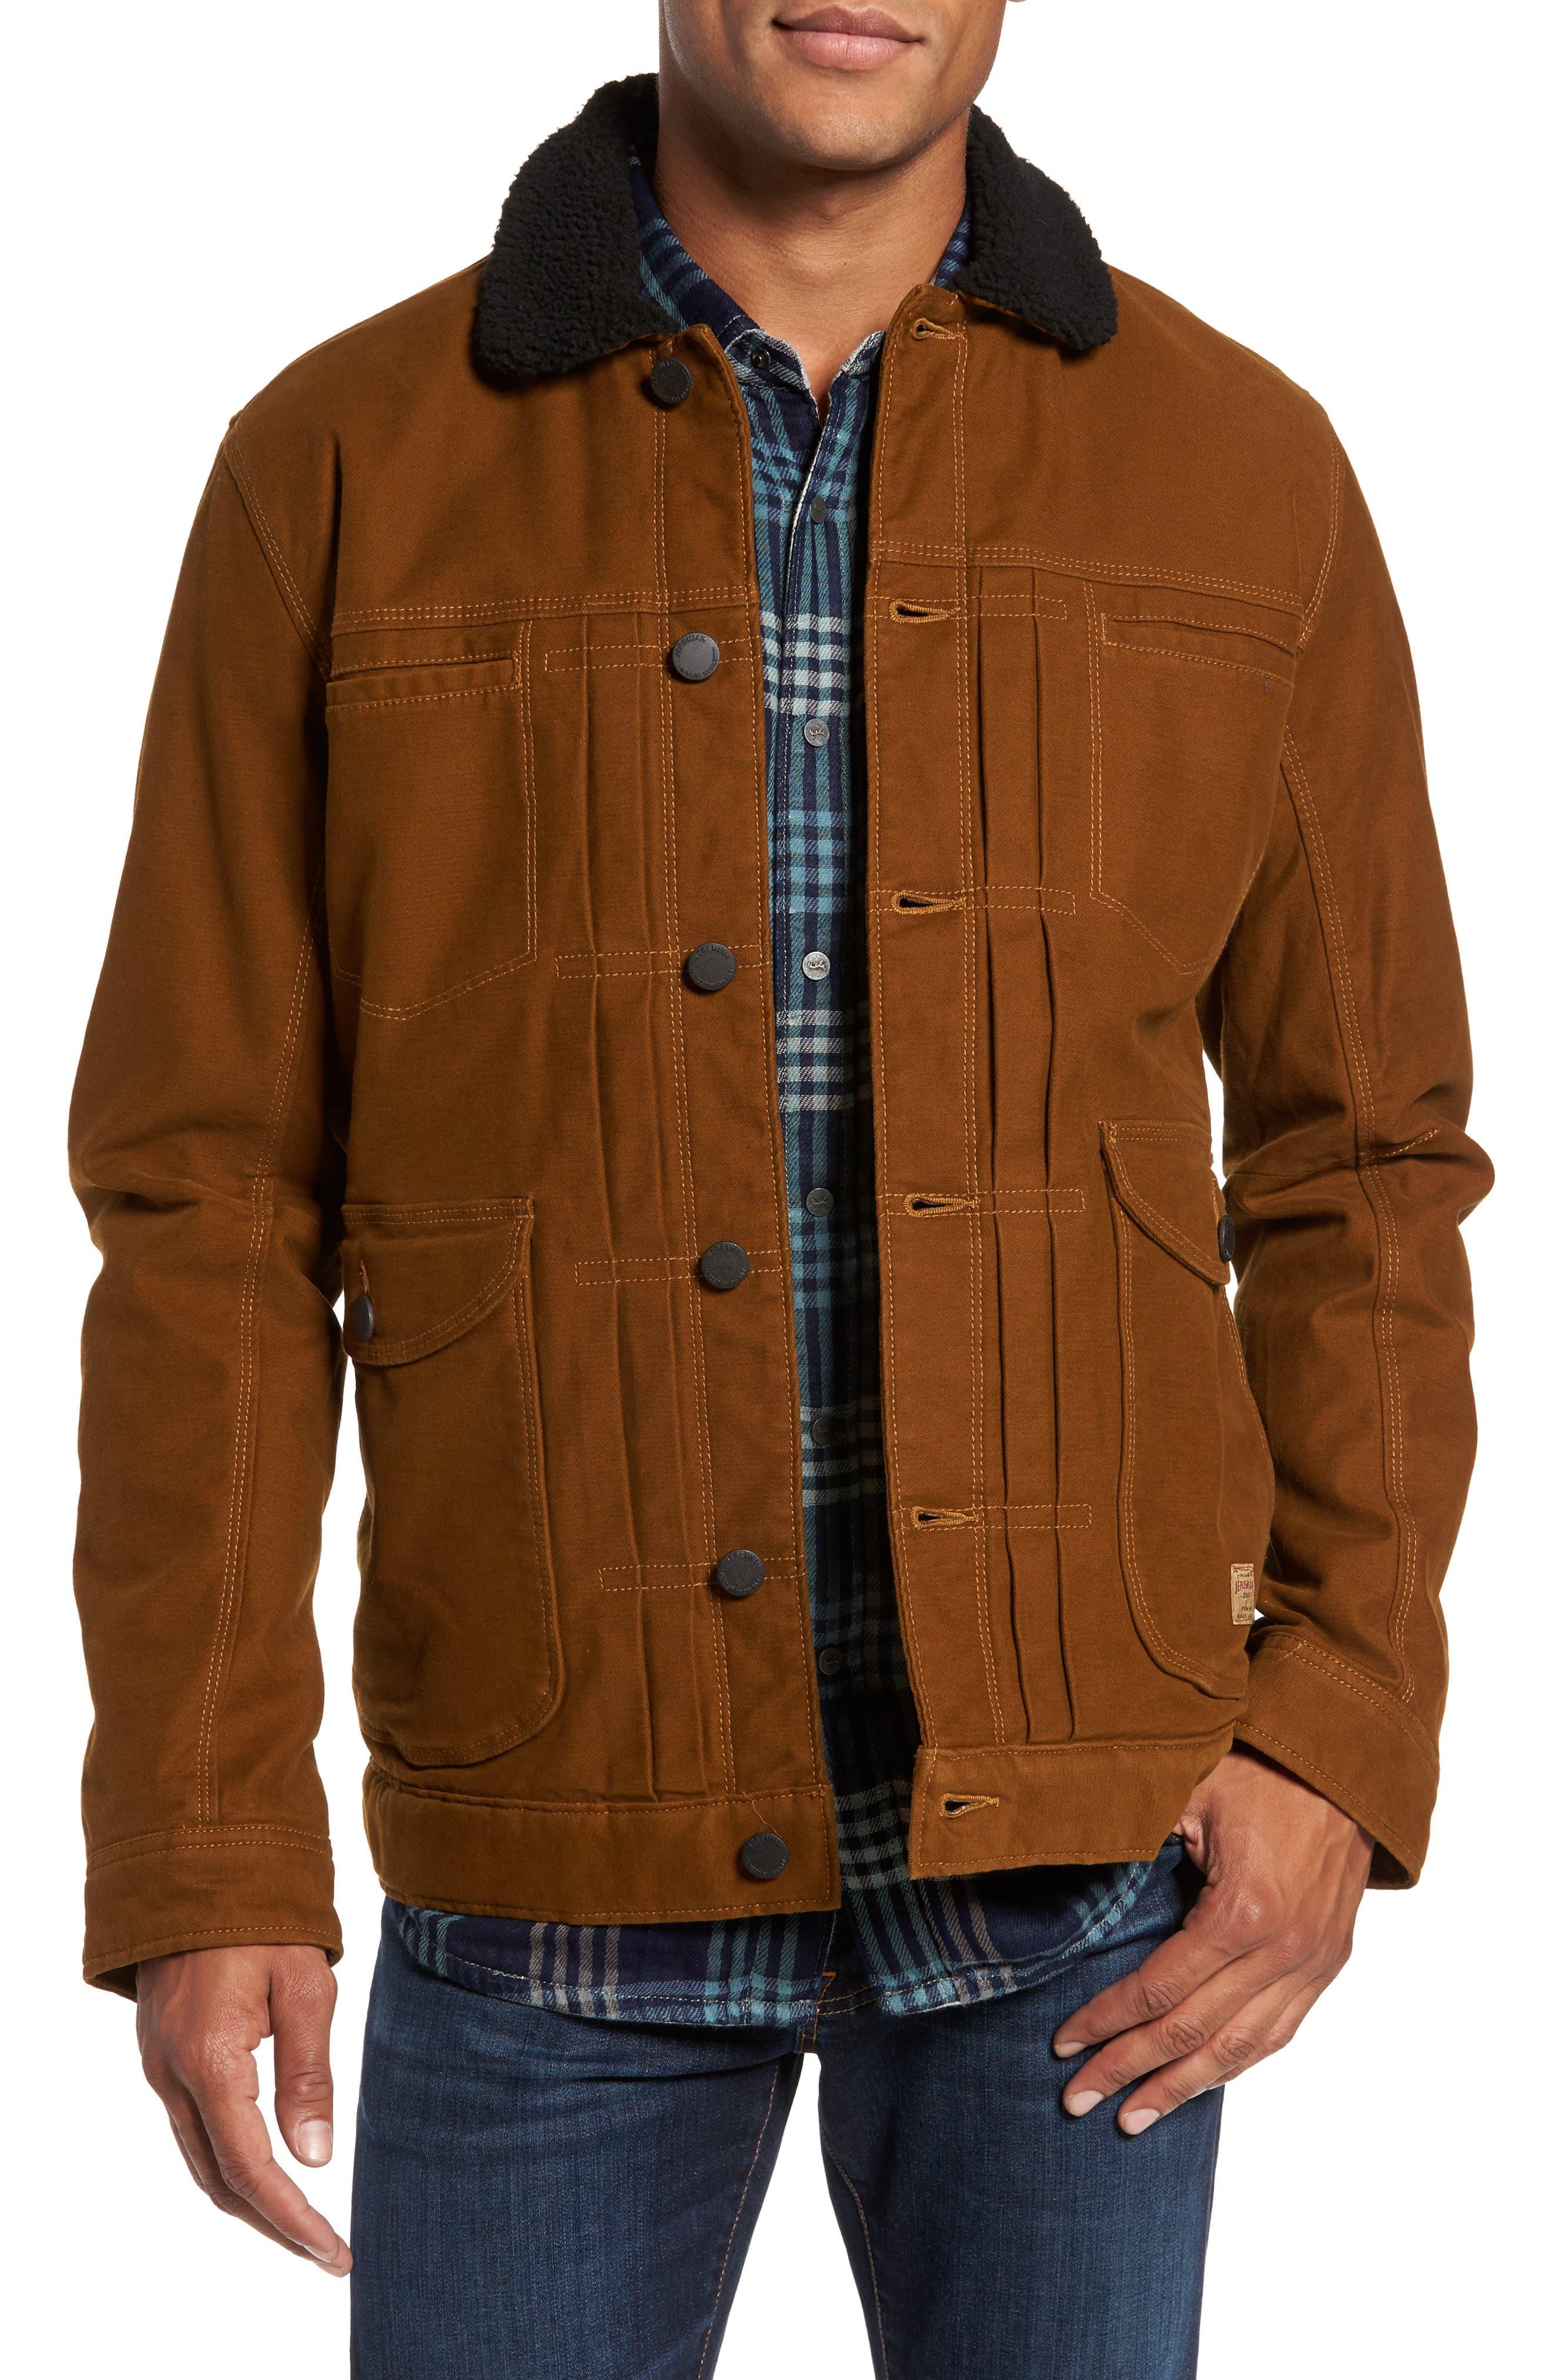 Main Image - Jeremiah Terra Broken Twill Jacket with Faux Shearling Trim